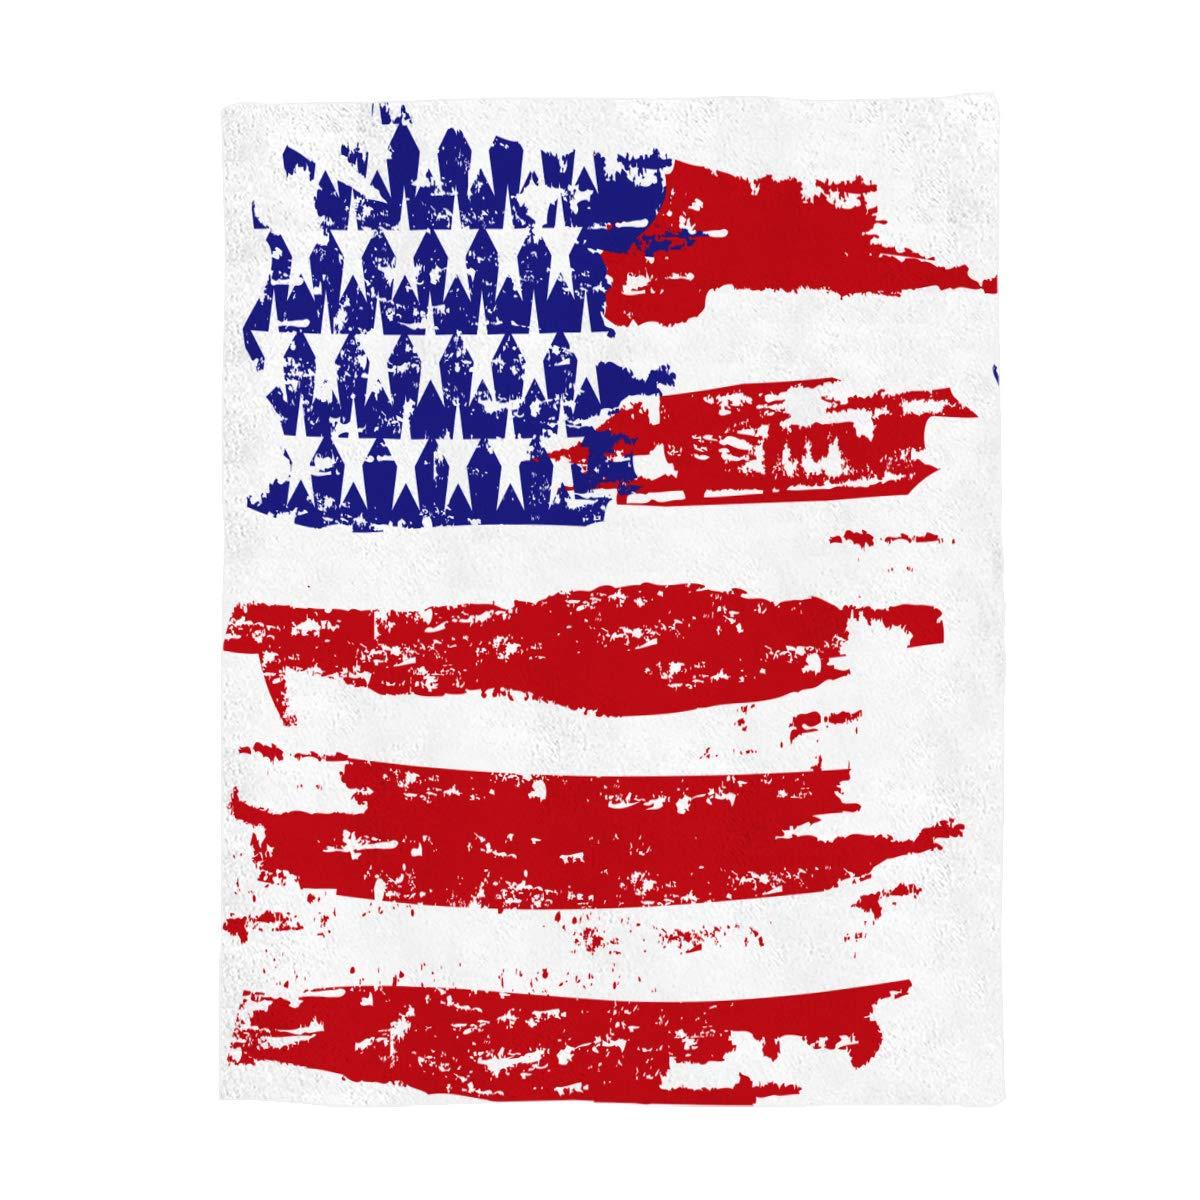 Funy Decor フランネルフリーススローブランケット 抽象的なアメリカ国旗プリント 愛国心 ウルトラソフト 暖かい 快適 オールシーズン プレミアムベッドブランケット 子供/女の子/男の子/女の子/大人用 60 x 80 LTL-201812060612FDRSLSZ00560MTADFDR B07L5D88MT  60 x 80